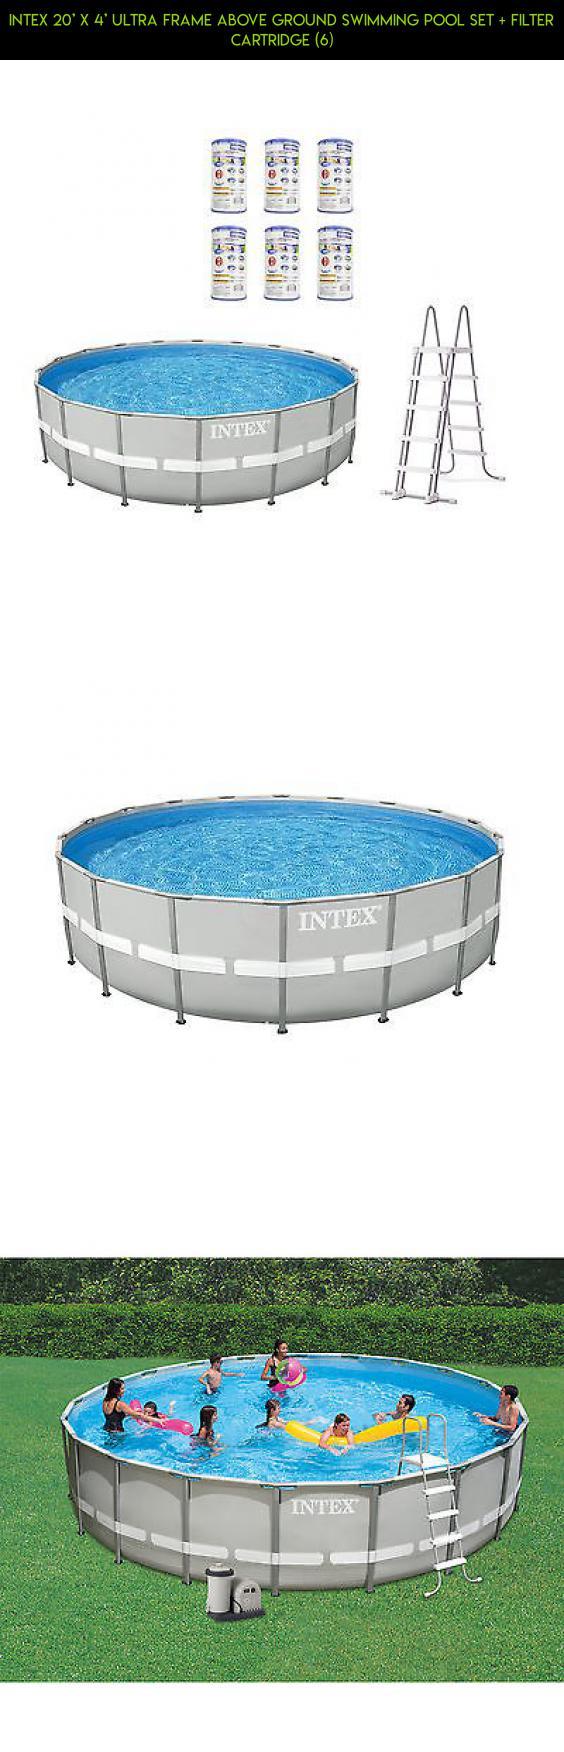 Intex 20\' x 4\' Ultra Frame Above Ground Swimming Pool Set + Filter ...